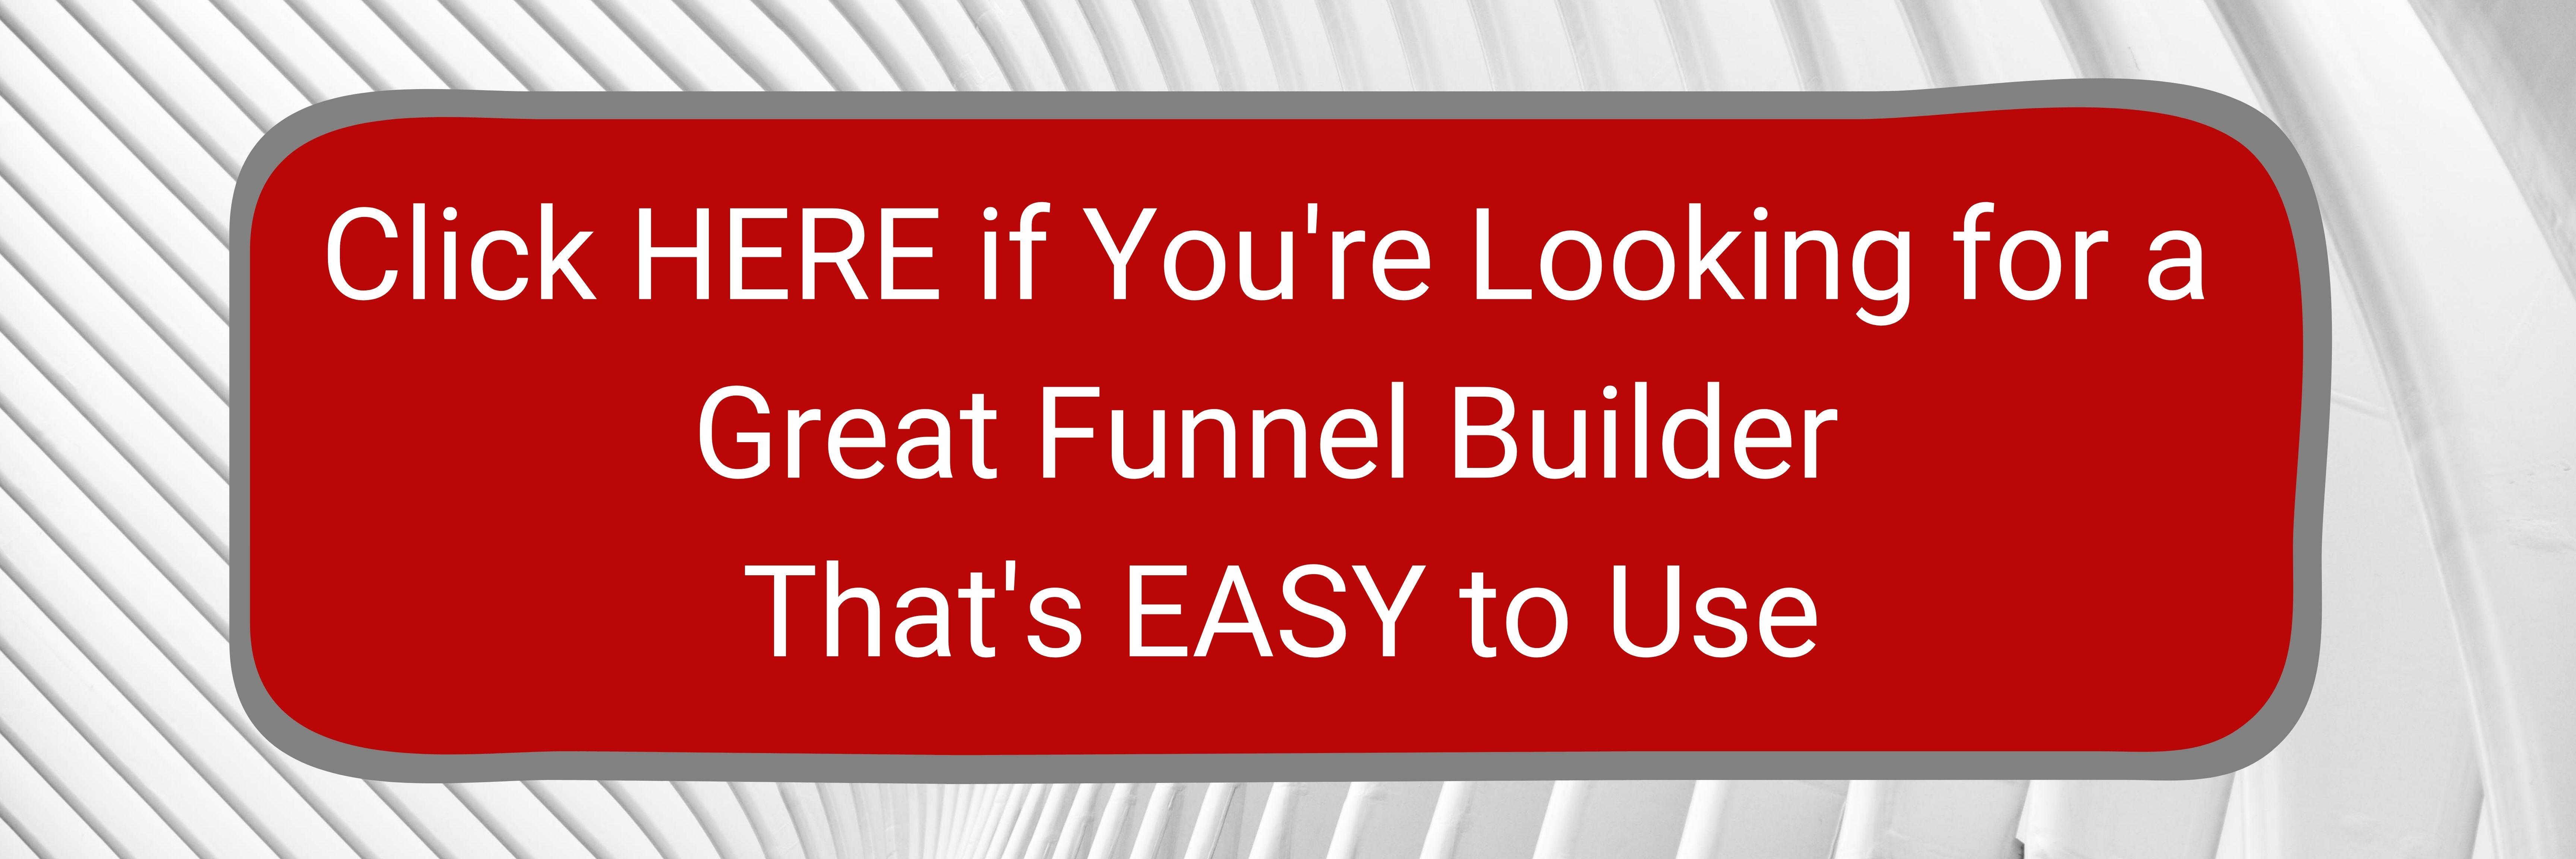 Affiliate Marketing Tools - Funnel Builder Banner